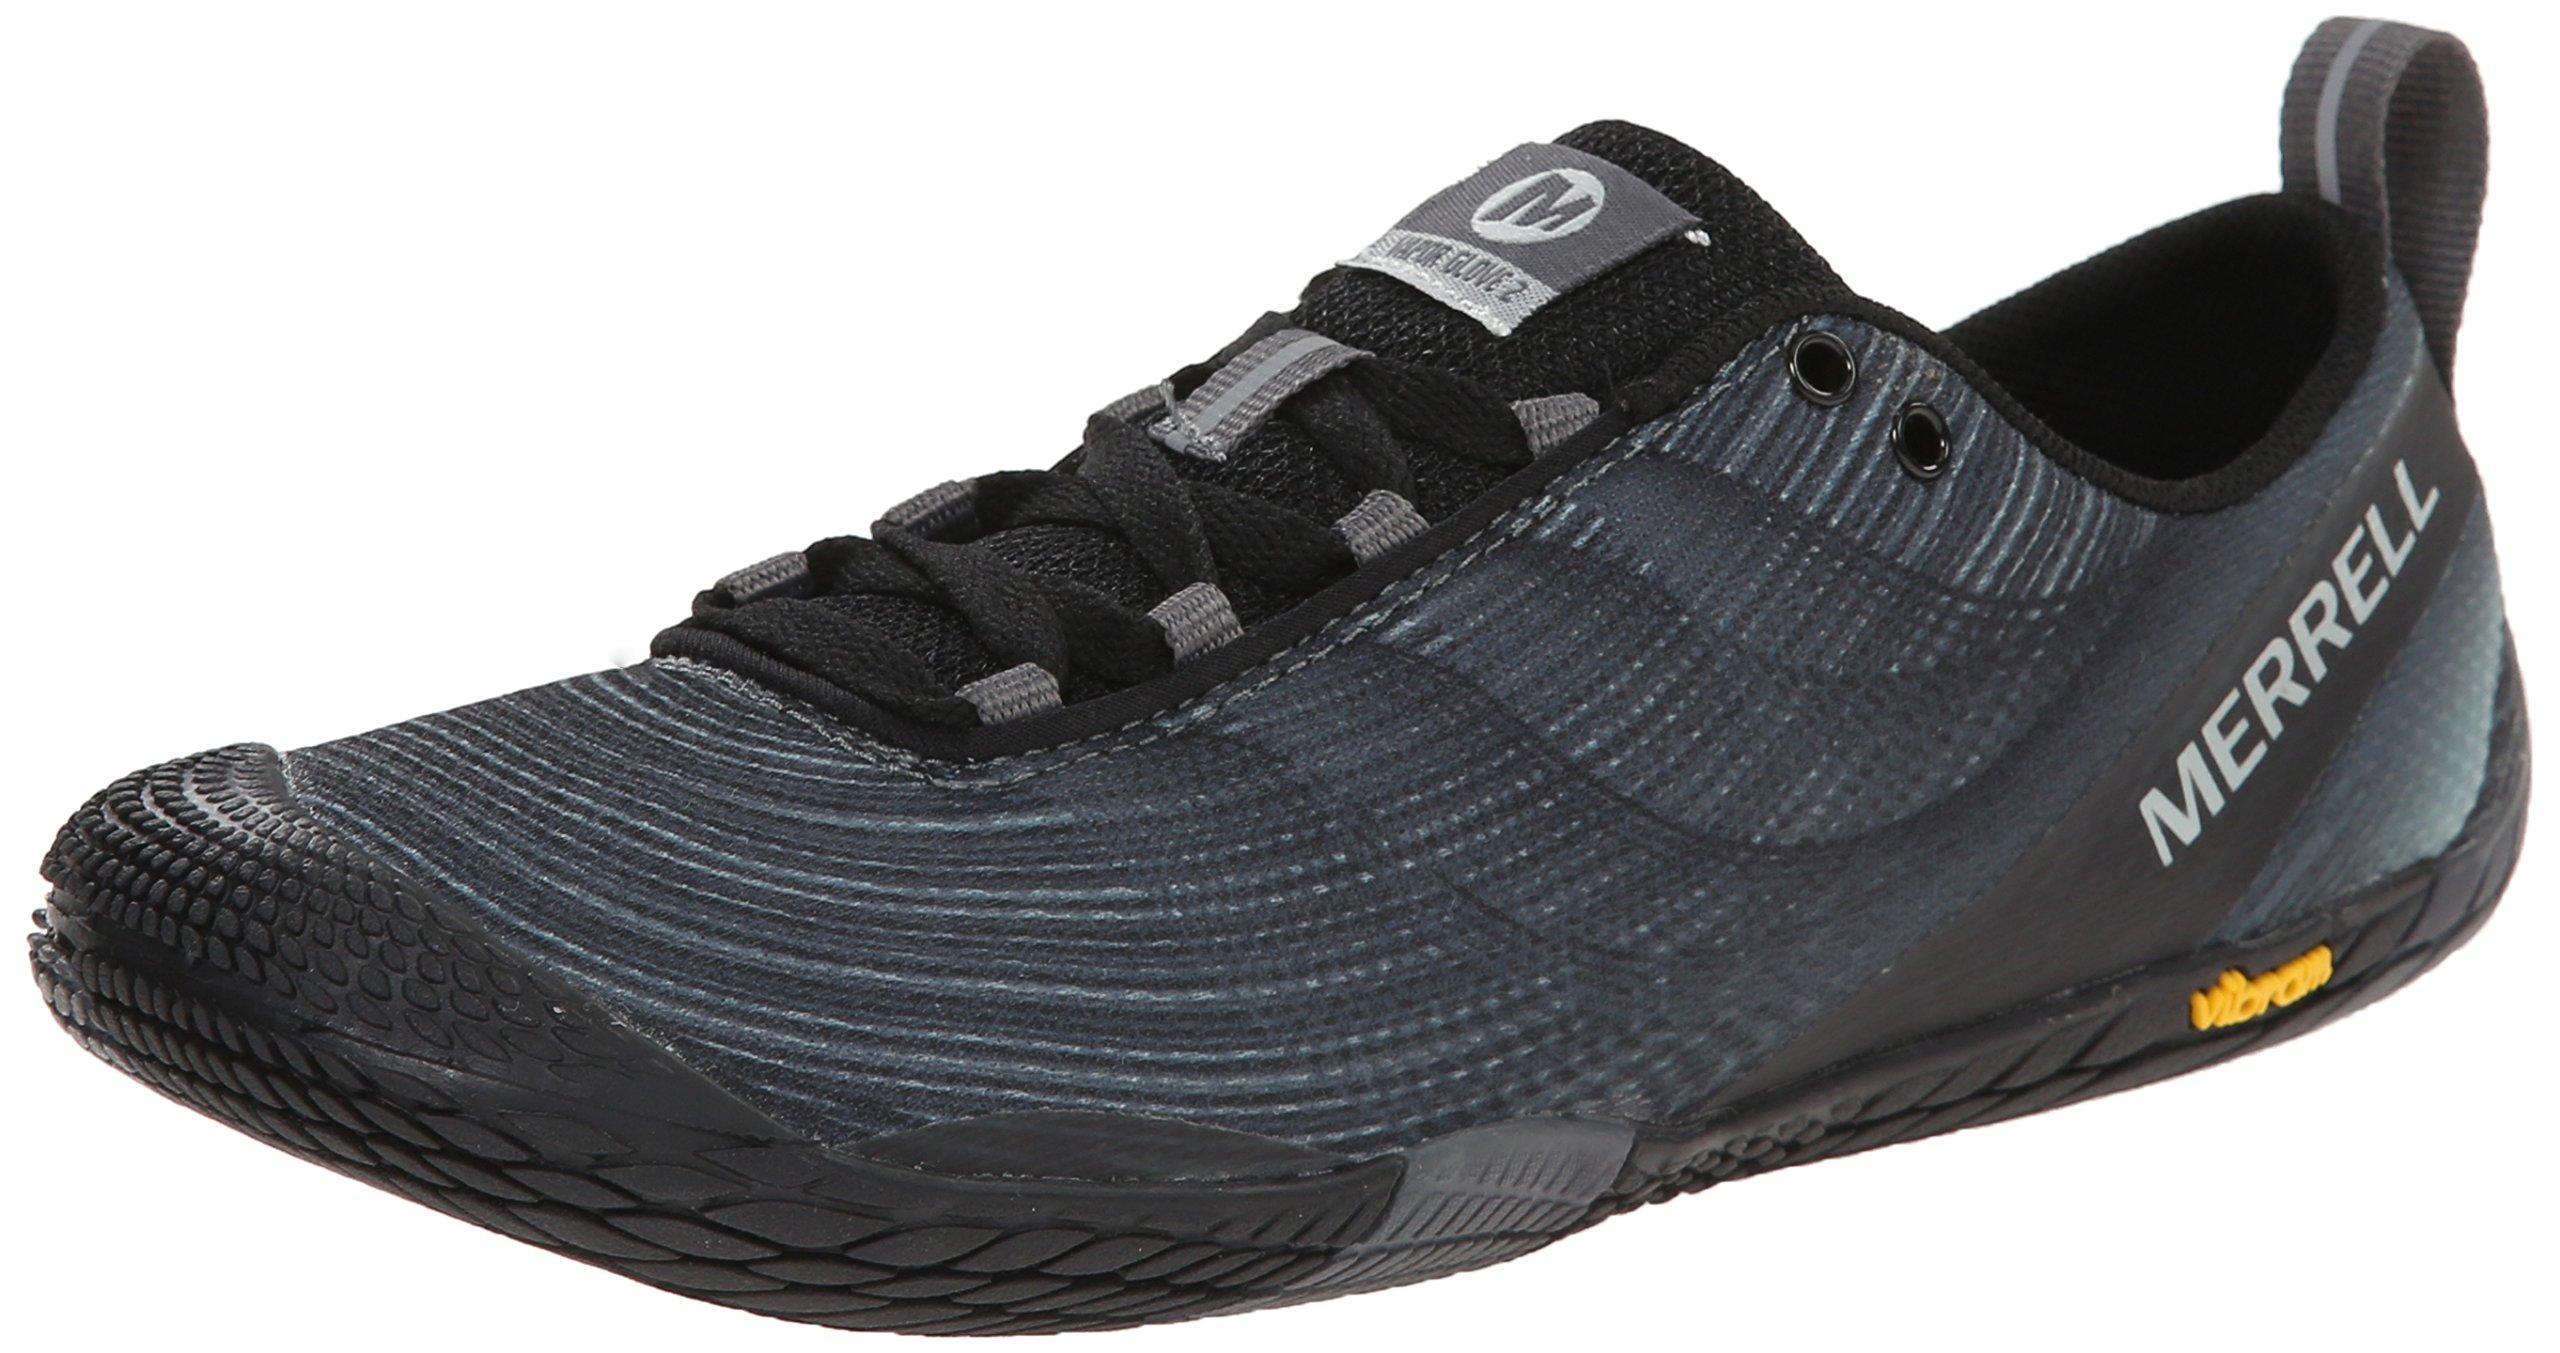 Merrell Women's Vapor Glove 2 Trail Running Shoe, Black/Castle Rock, 5 M US